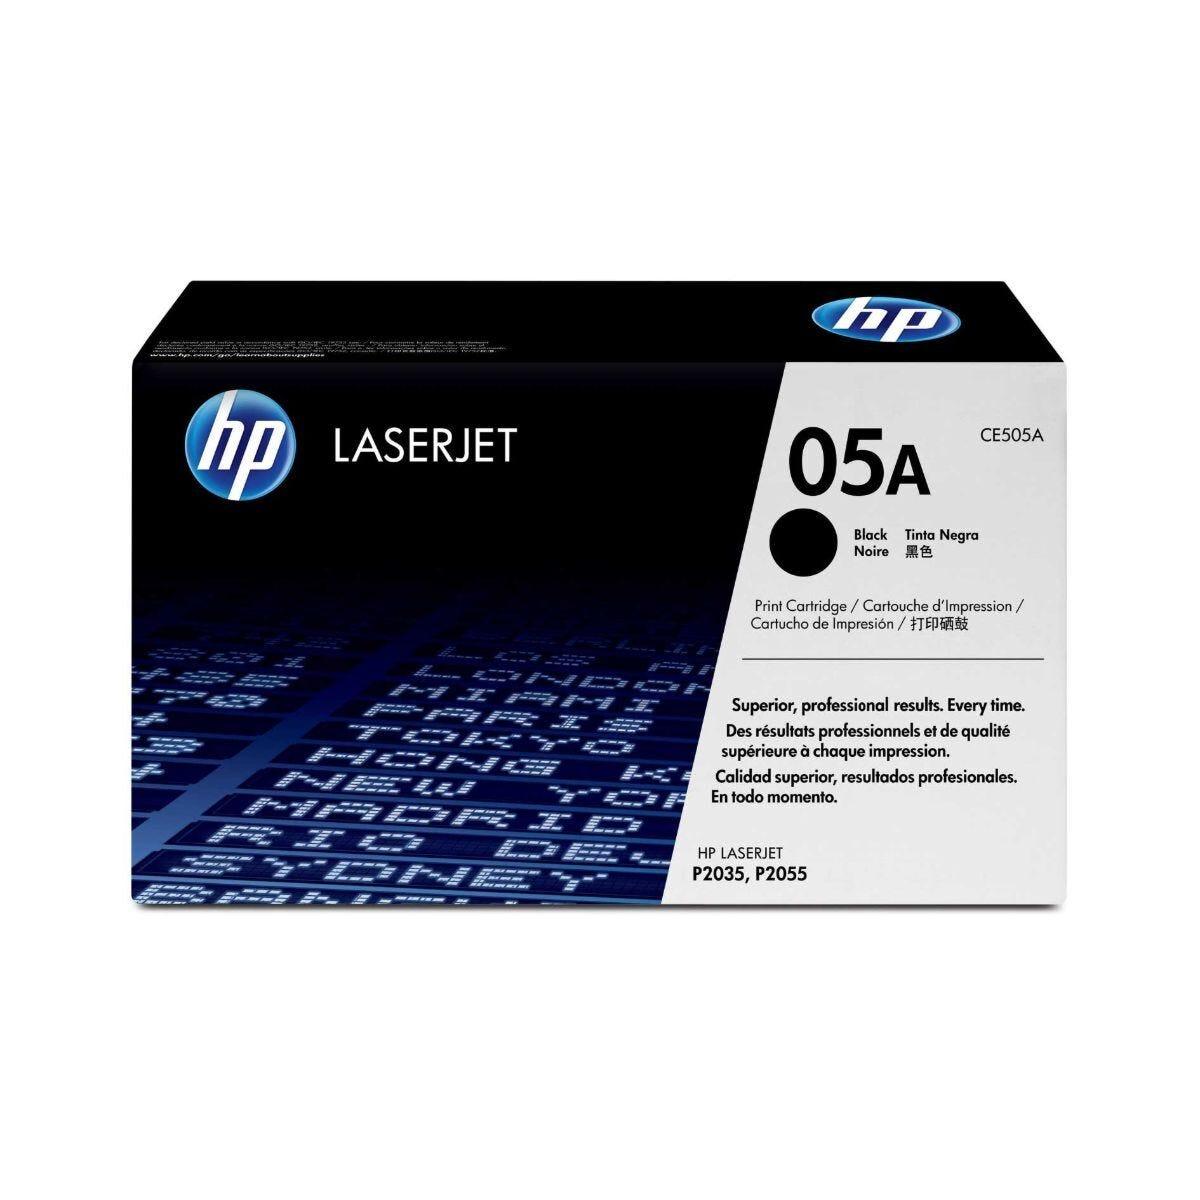 HP 05A CE505A Laser Printer Ink Toner Cartridge